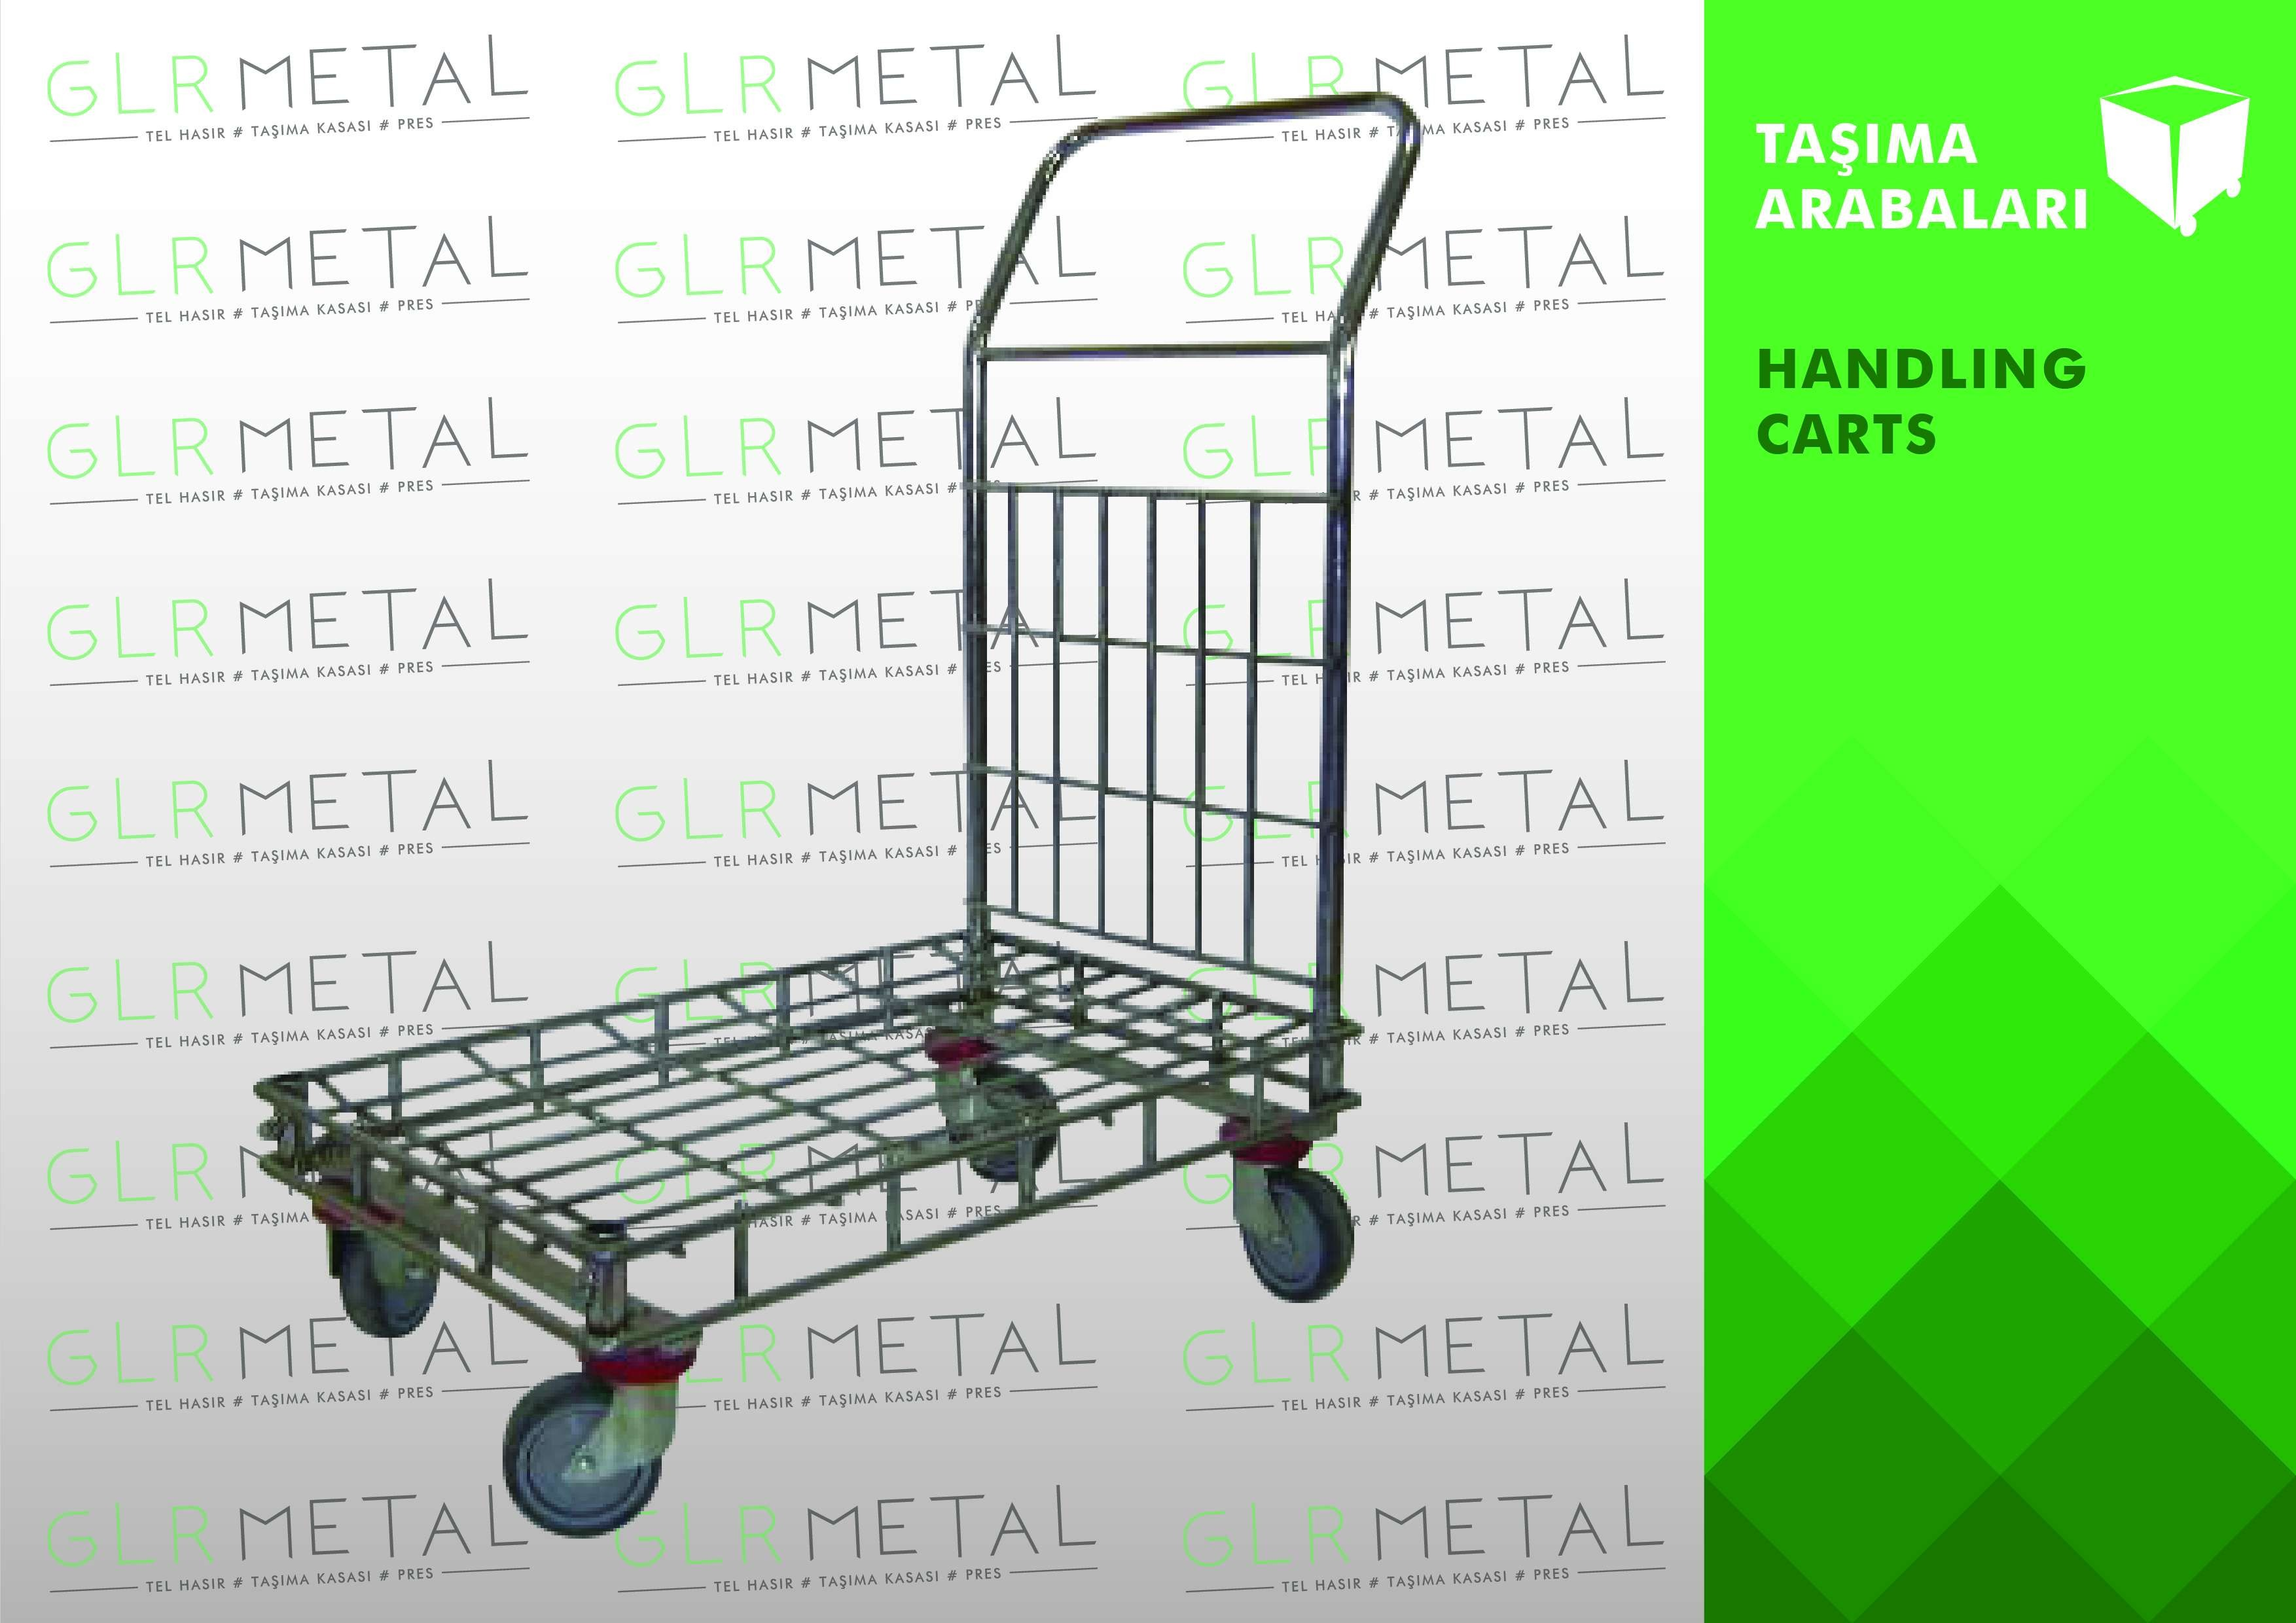 Handling Carts